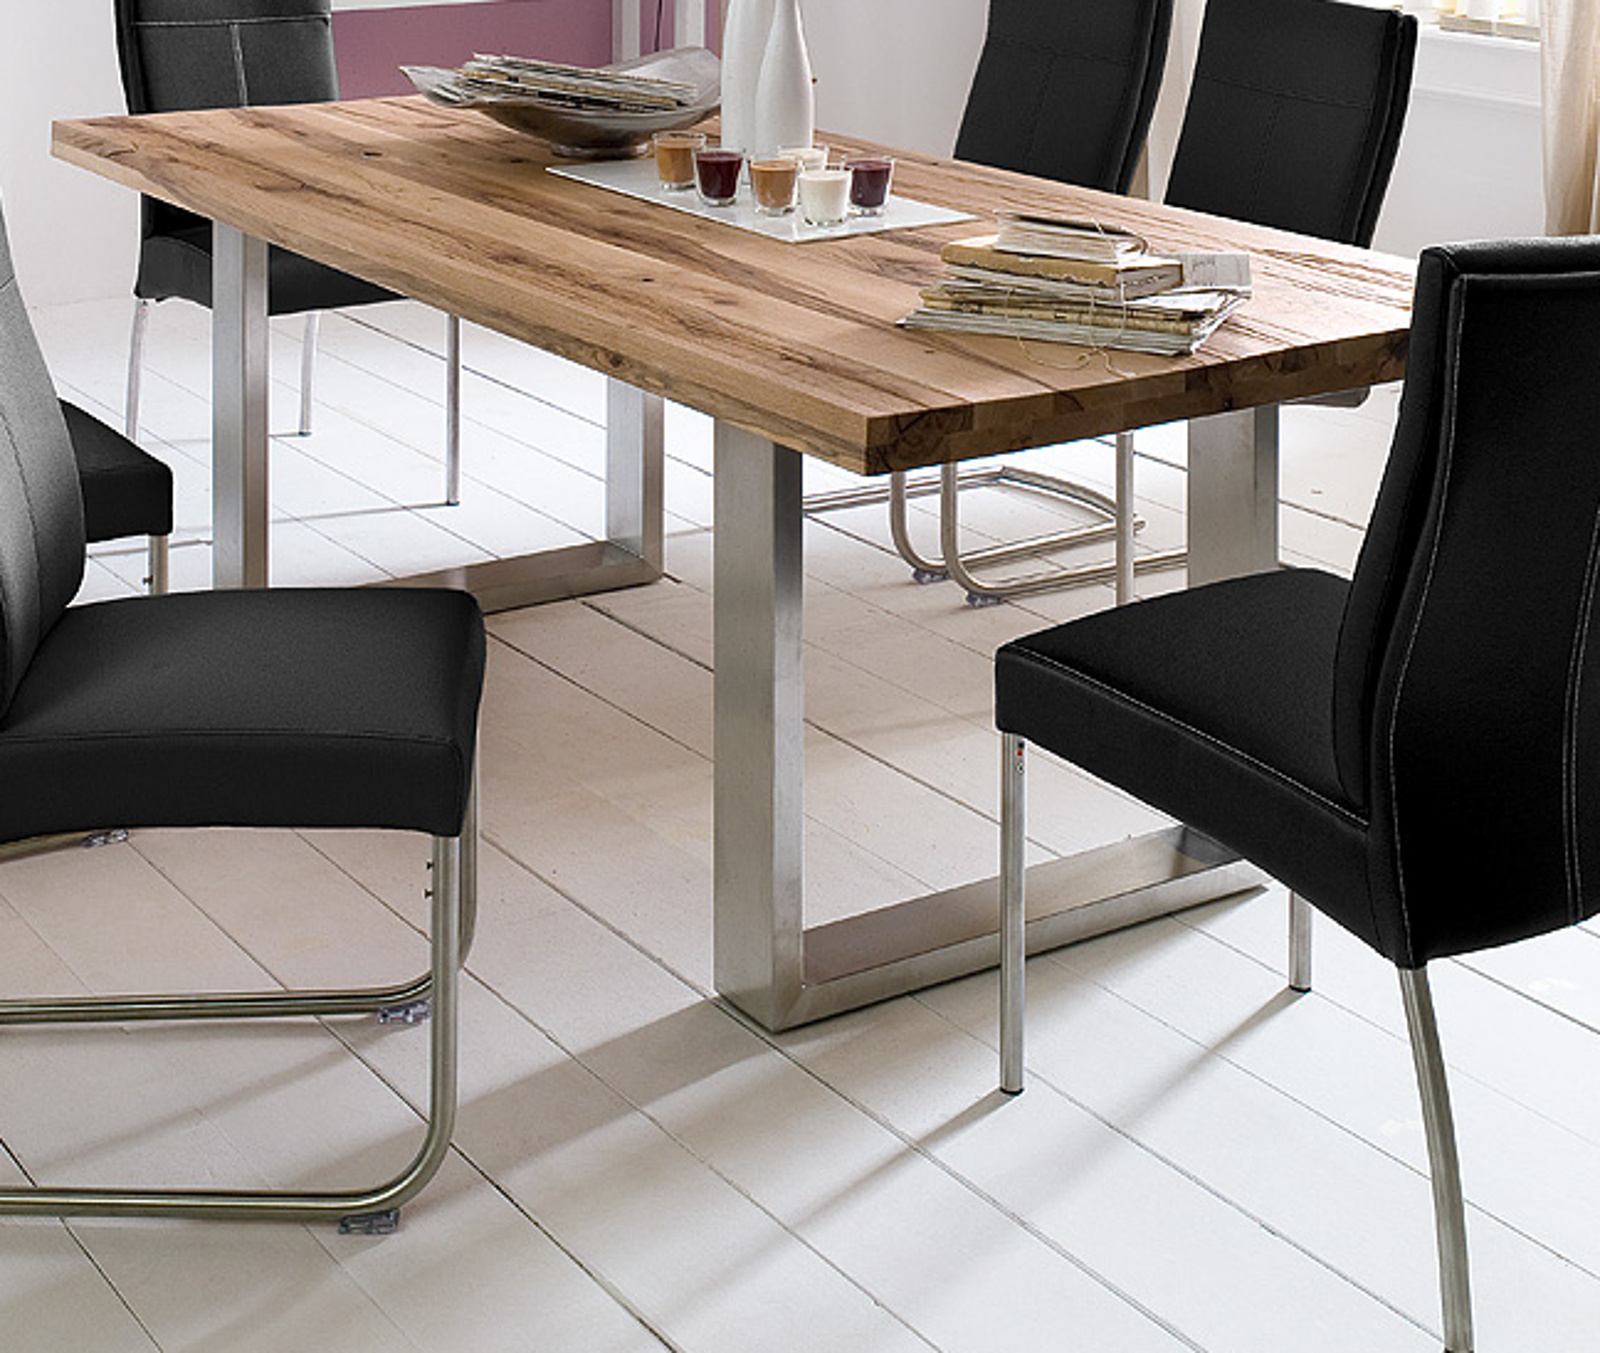 Moderne Büromöbel in Kirschbaum - Designermöbel - moderne Möbel ...